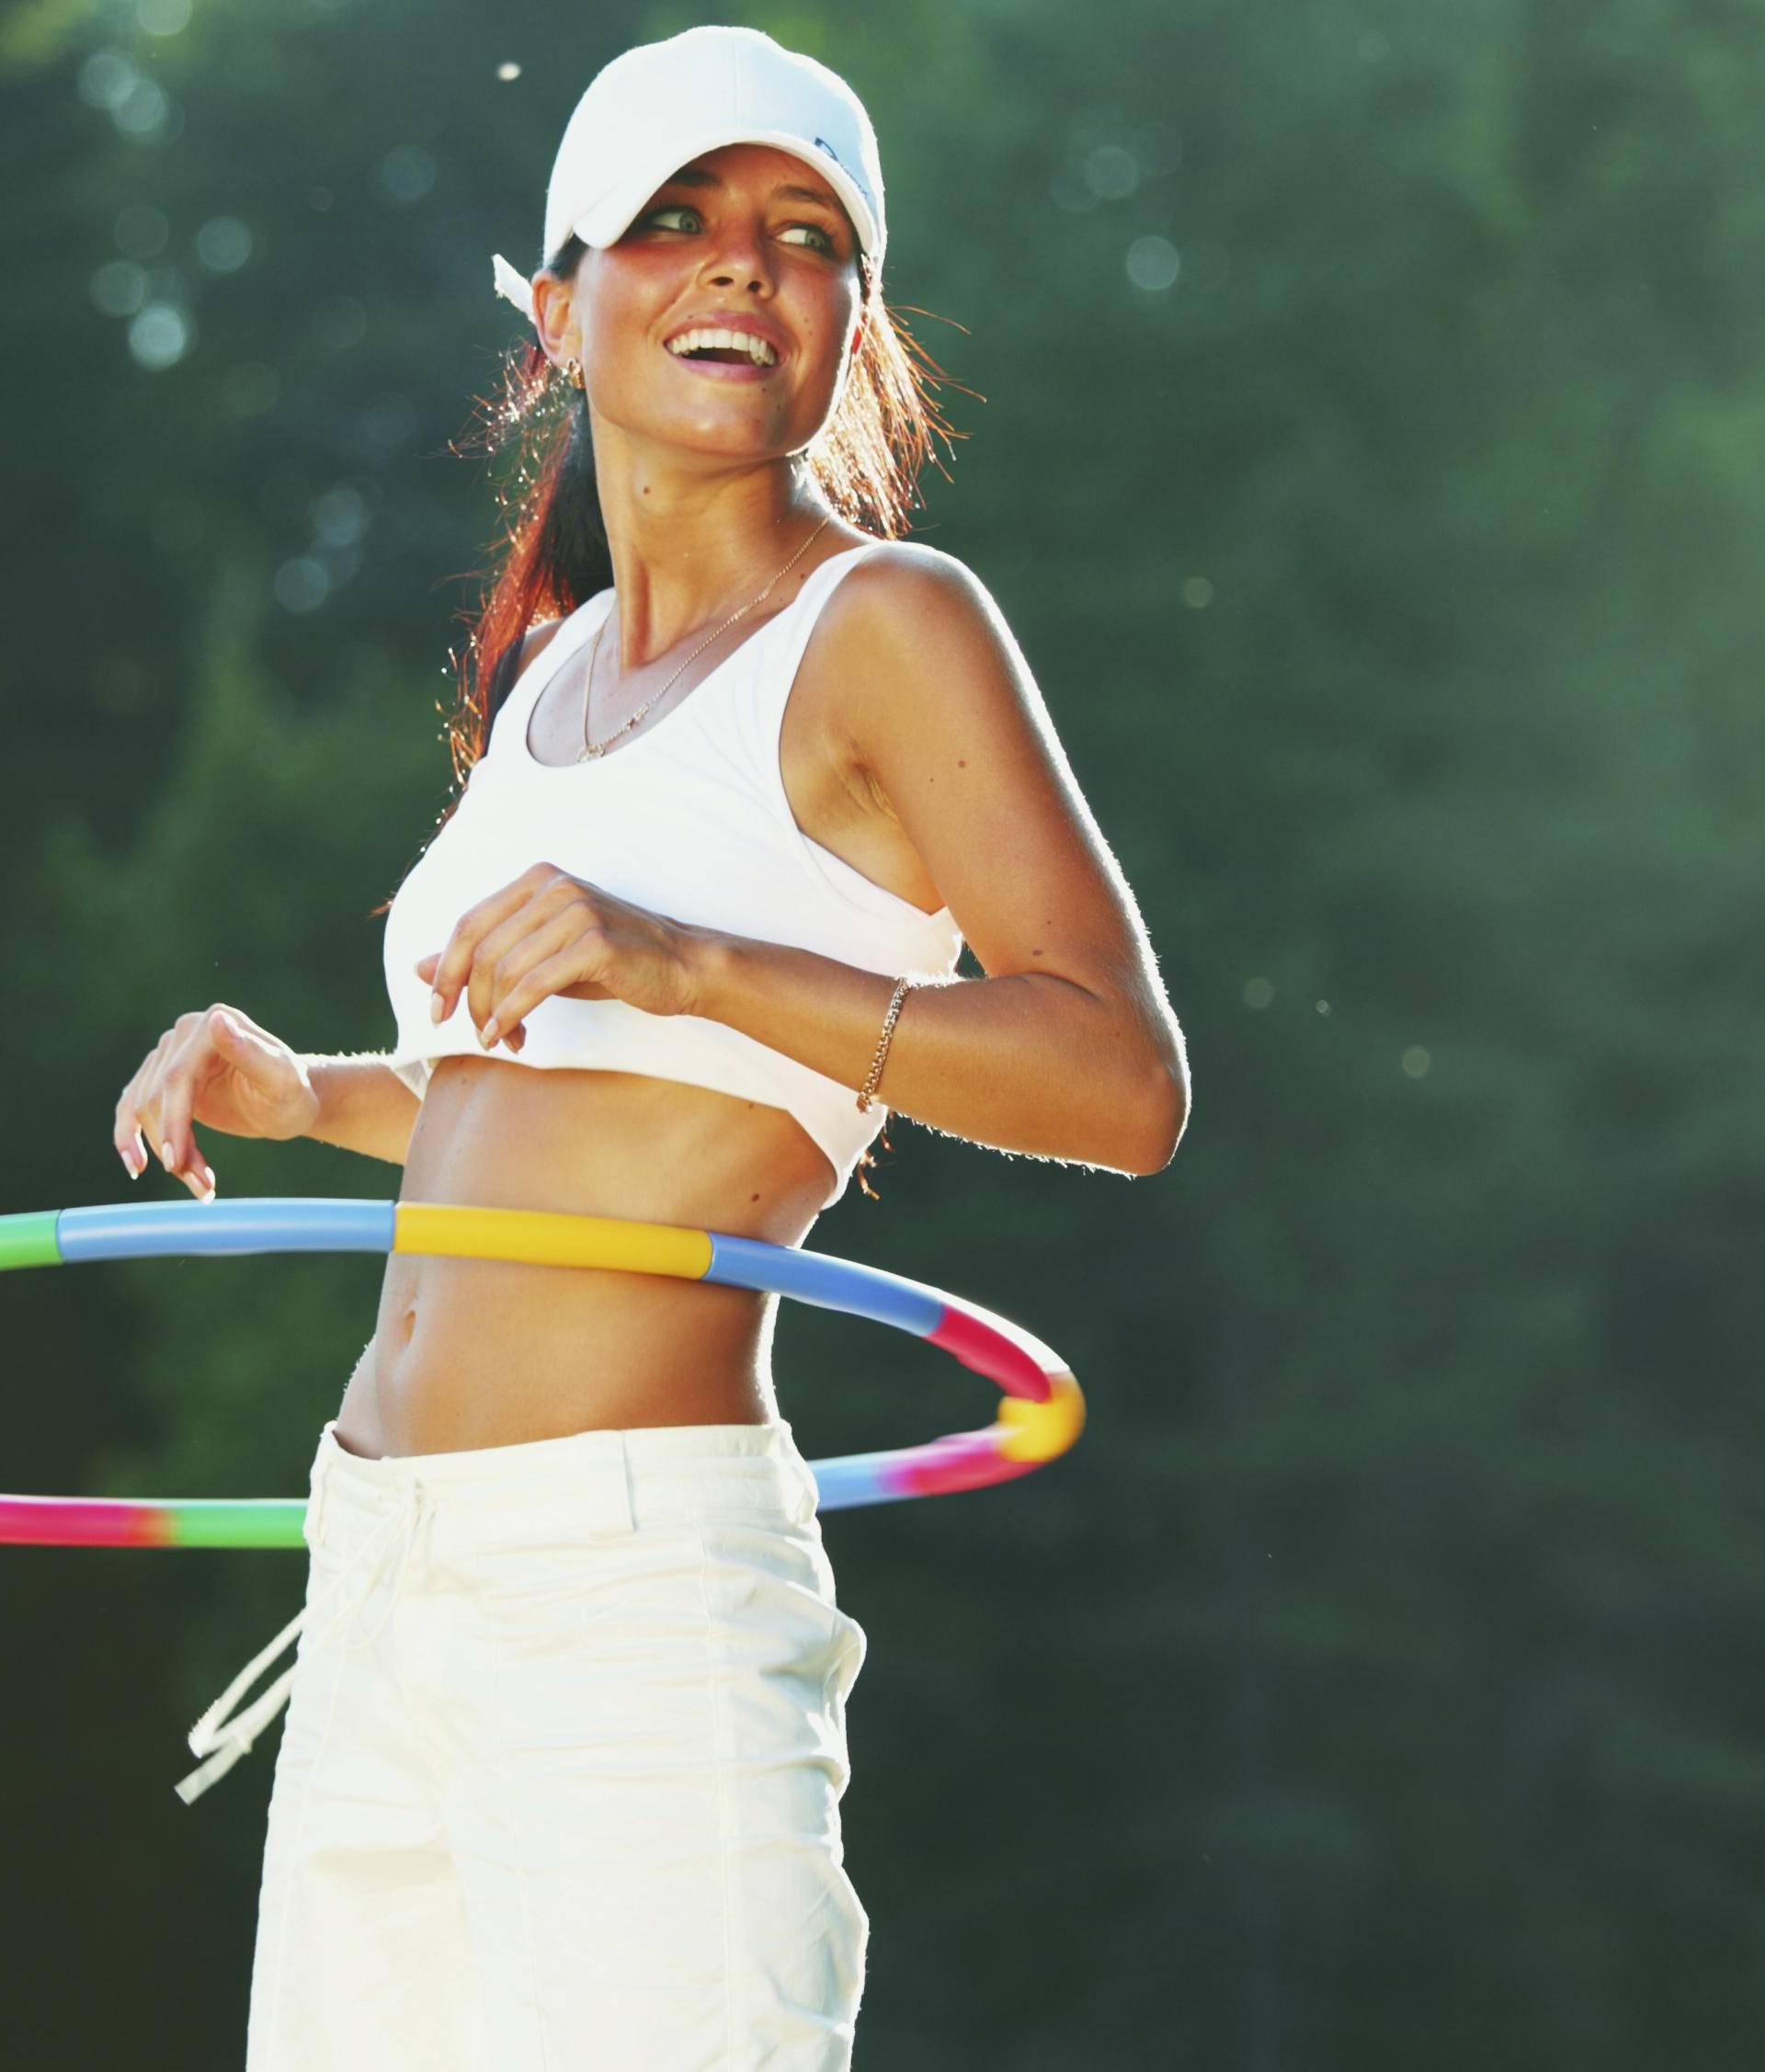 Hodanjem i trčanjem  do sreće i boljeg sna: Odmah se pokrenite